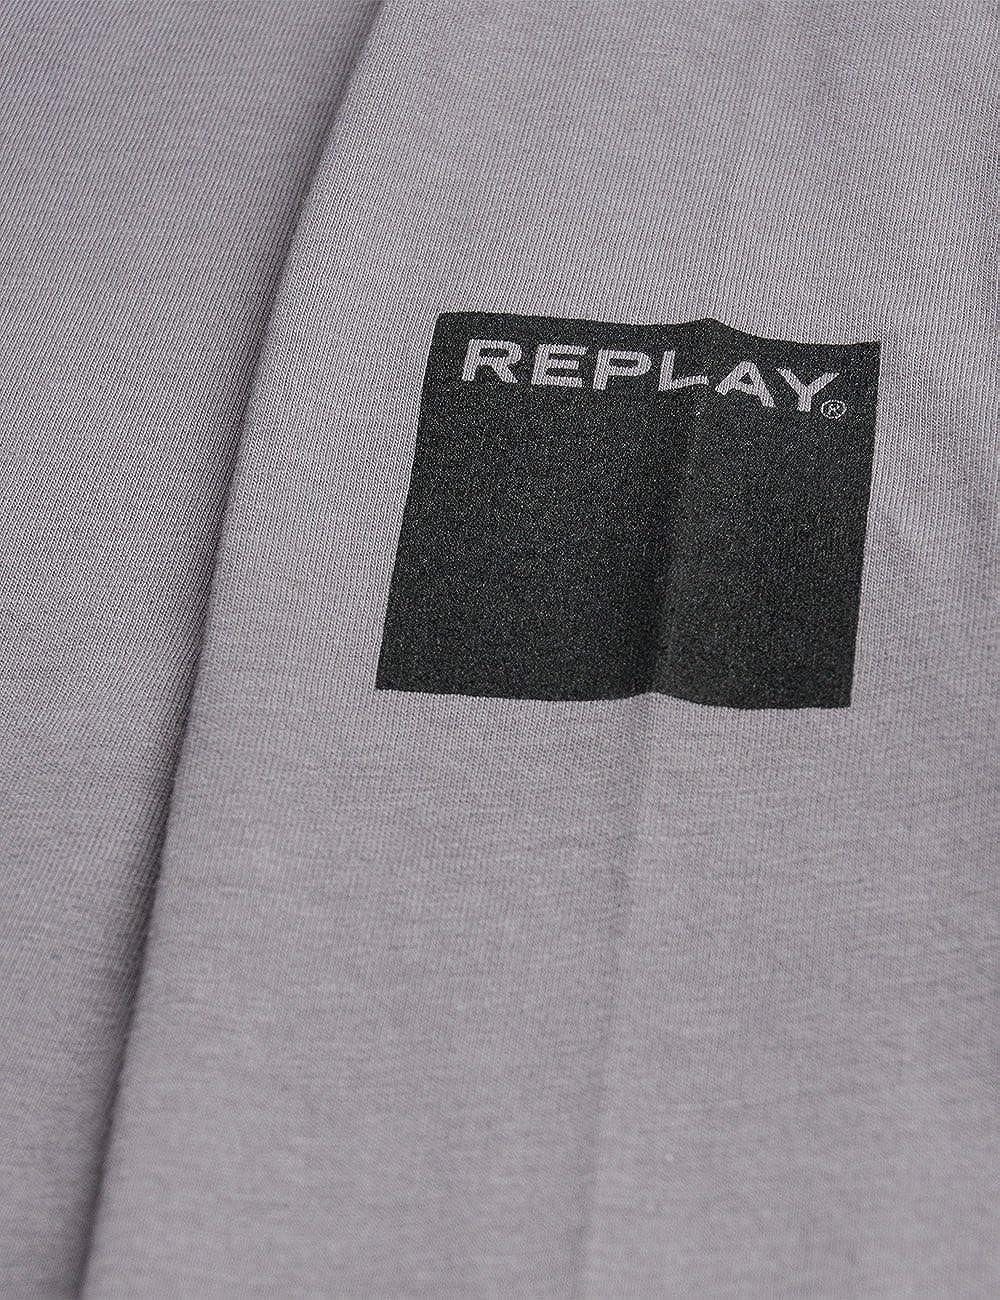 Replay Herren Langarmshirt B01N6EA2LO Langarmshirts Viele Viele Viele Sorten e2f1bb